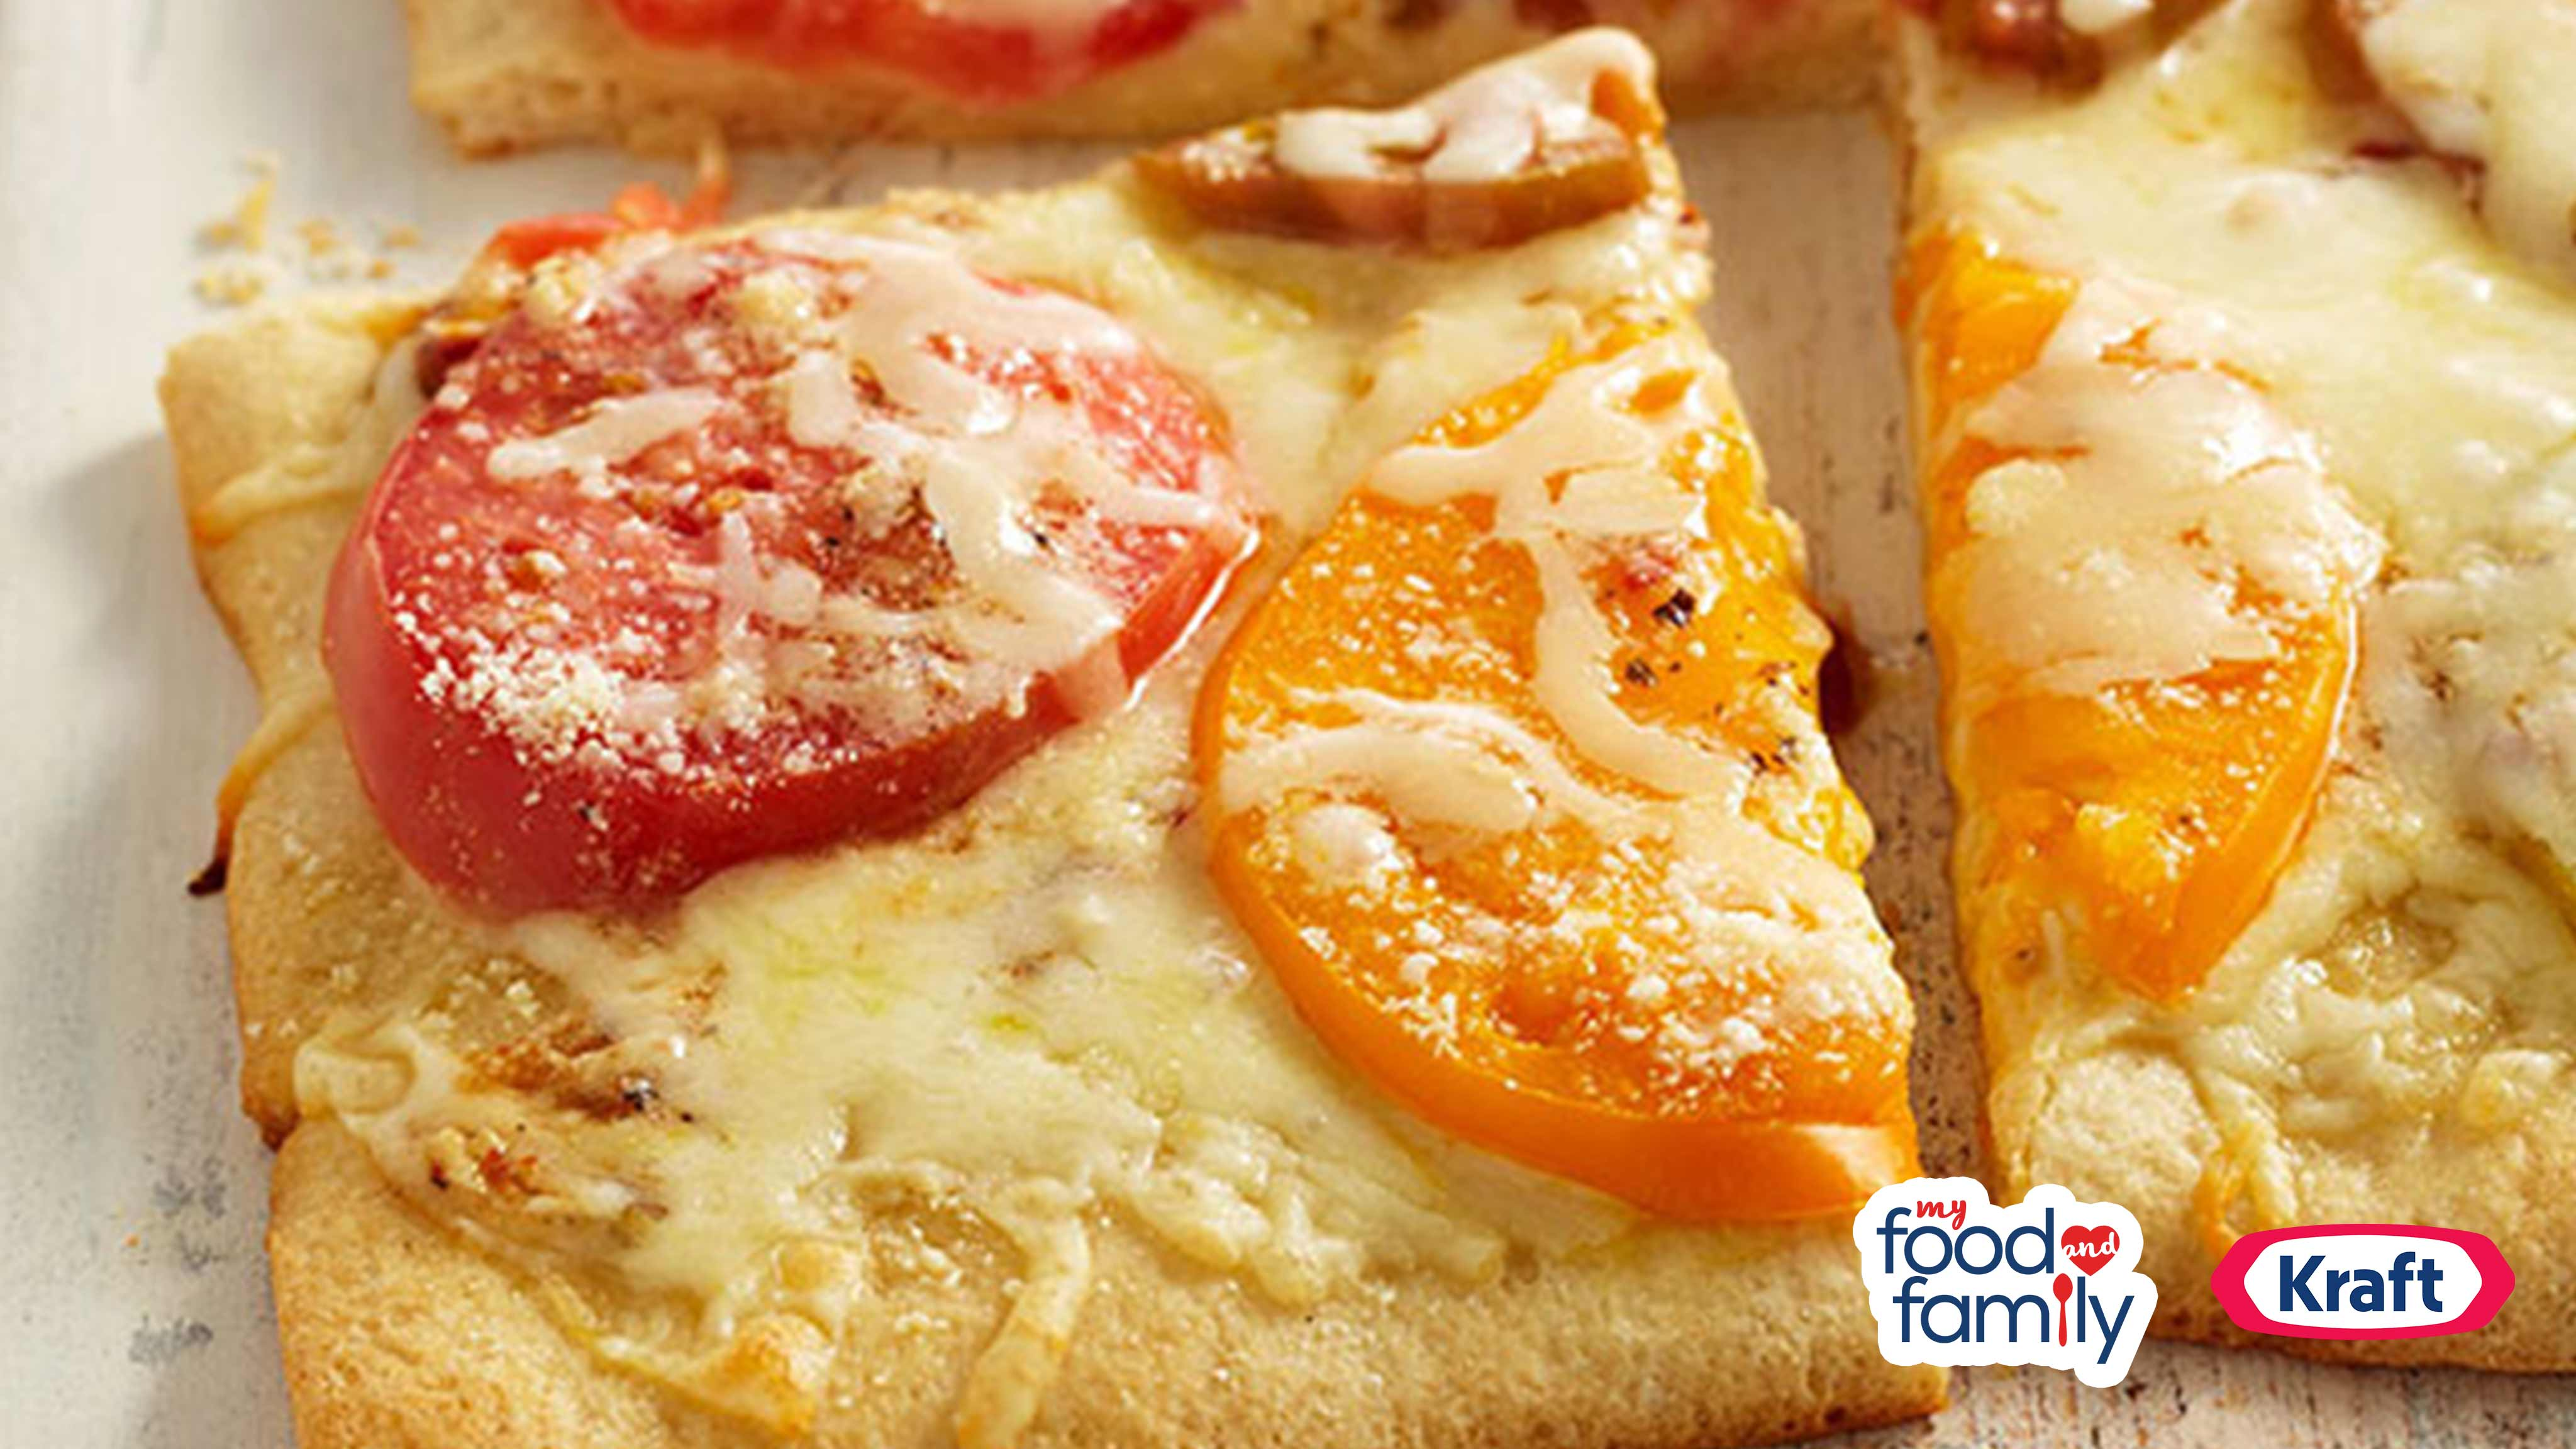 Image for Recipe Heirloom Pizza Margherita